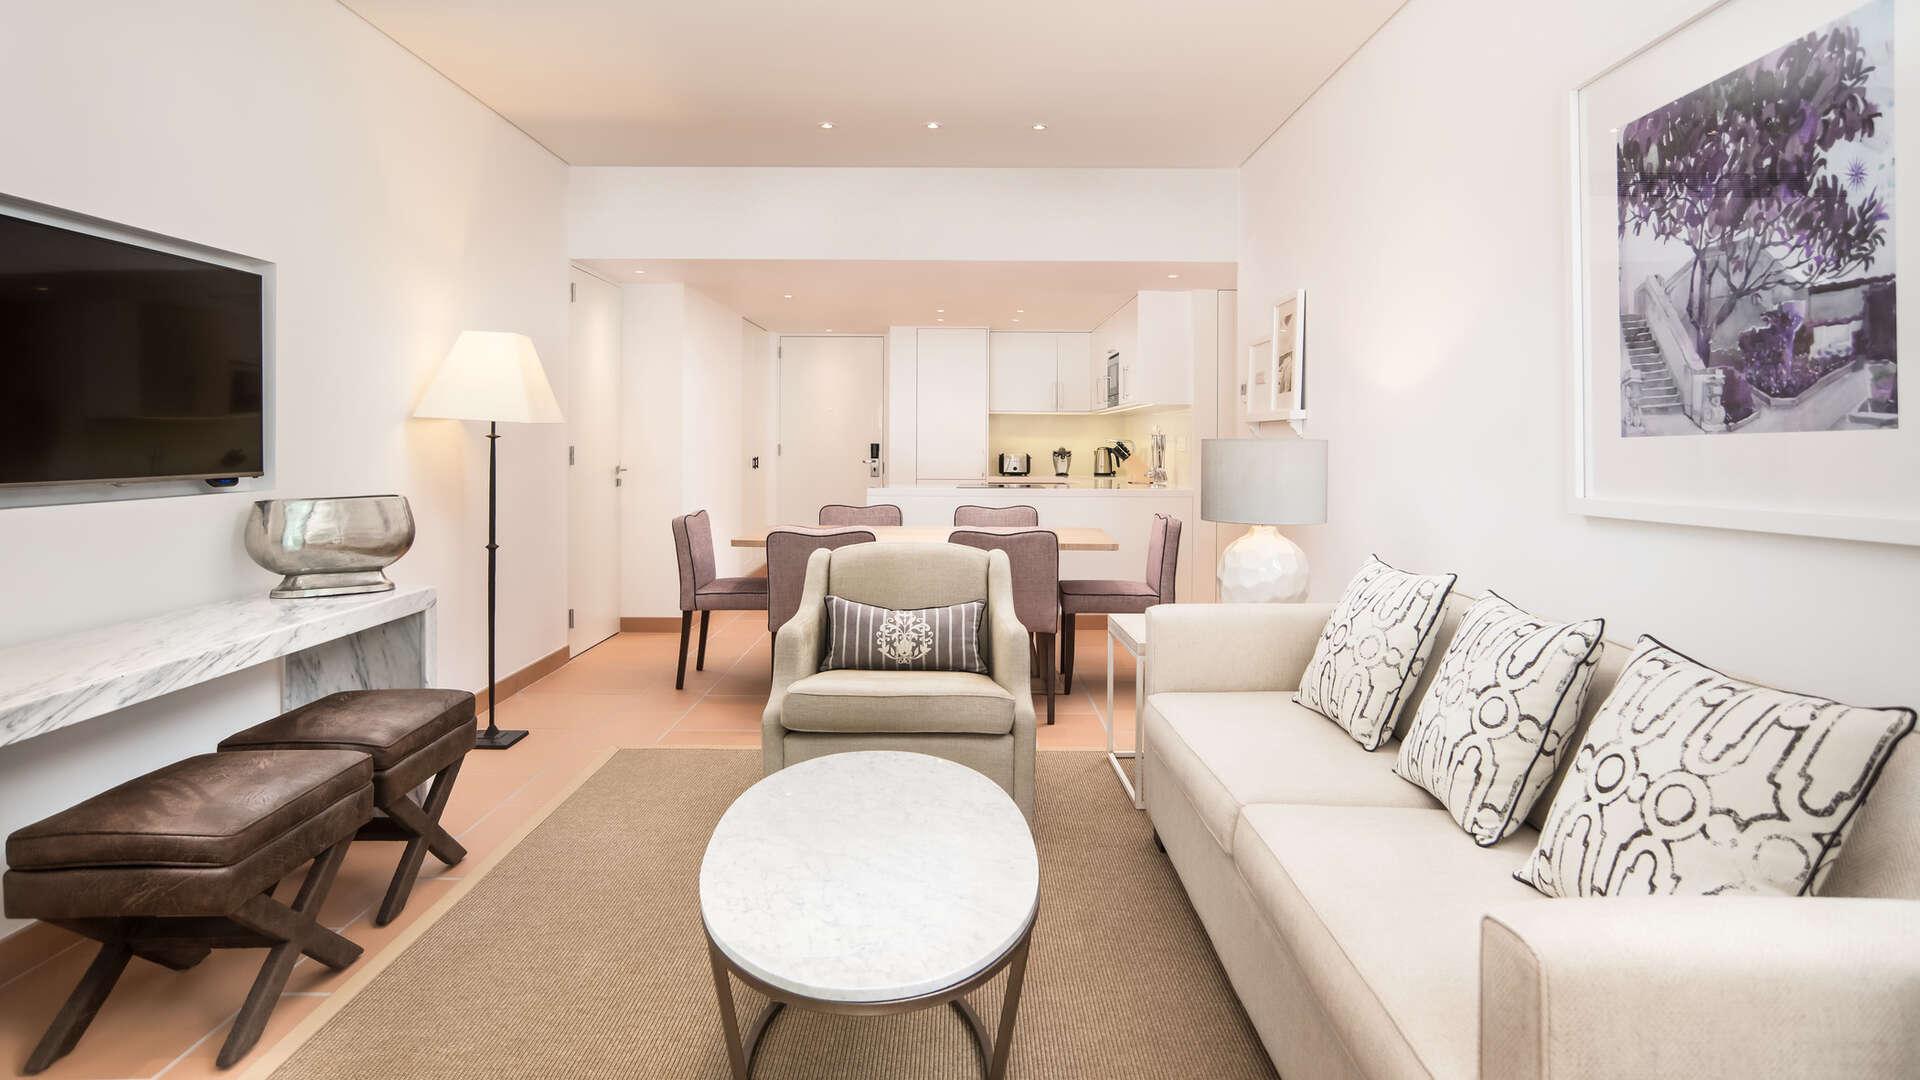 Luxury vacation rentals europe - Portugal - Algarve - Pine cliffs resort - Marriott Residential 2 BDM - Image 1/37